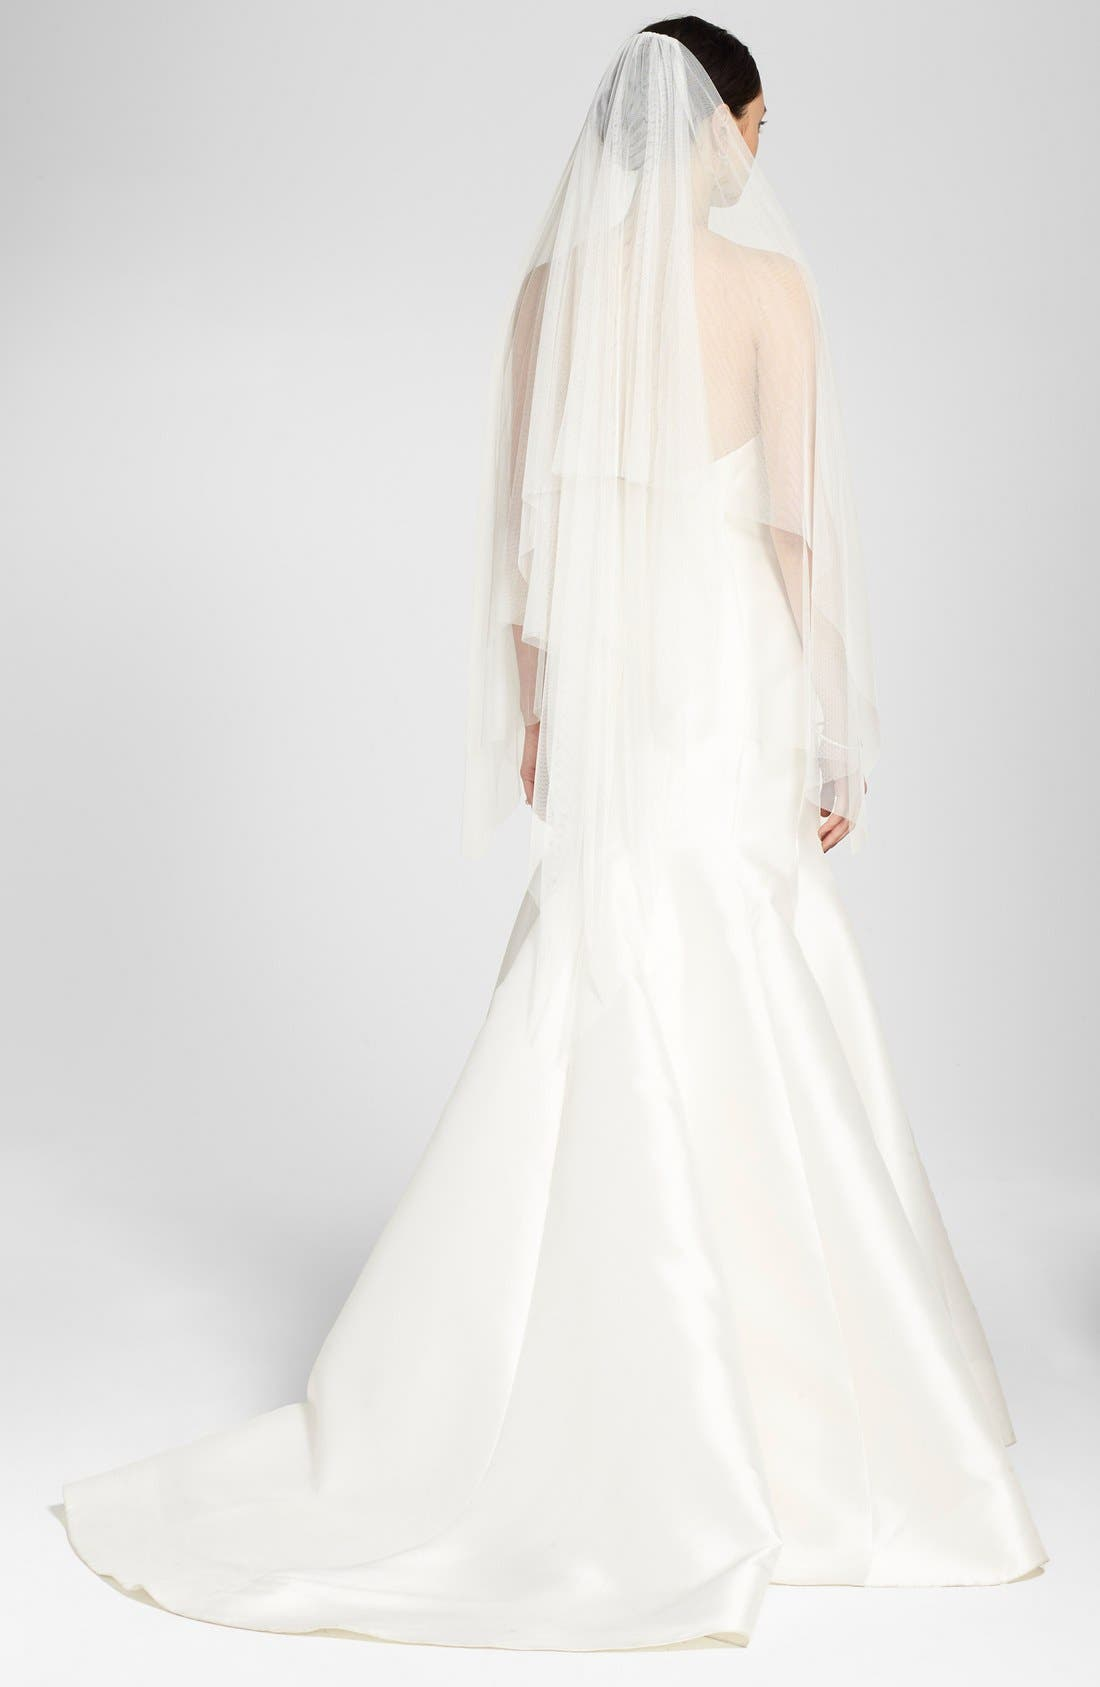 Toni Federici 'Padma' Spanish Tulle Waltz Length Veil